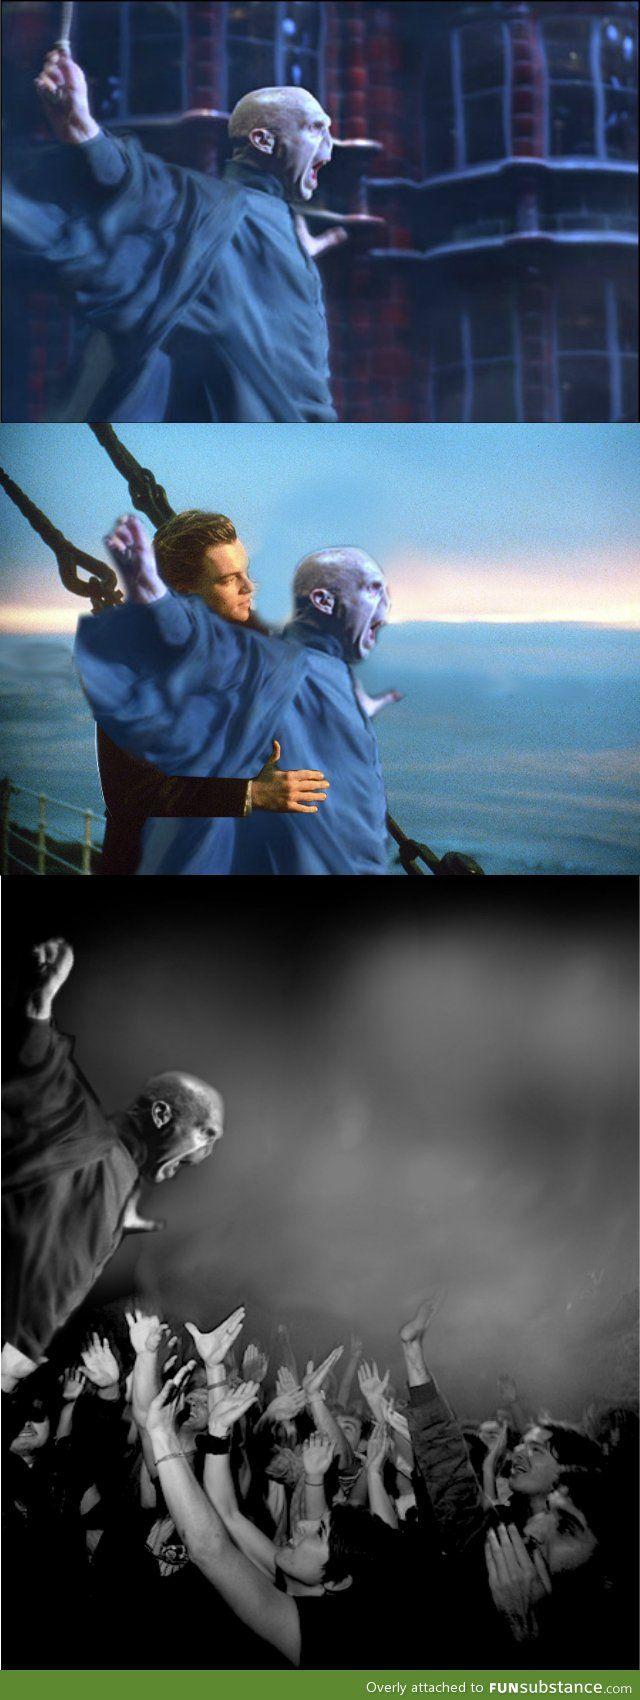 Lord Voldemort?